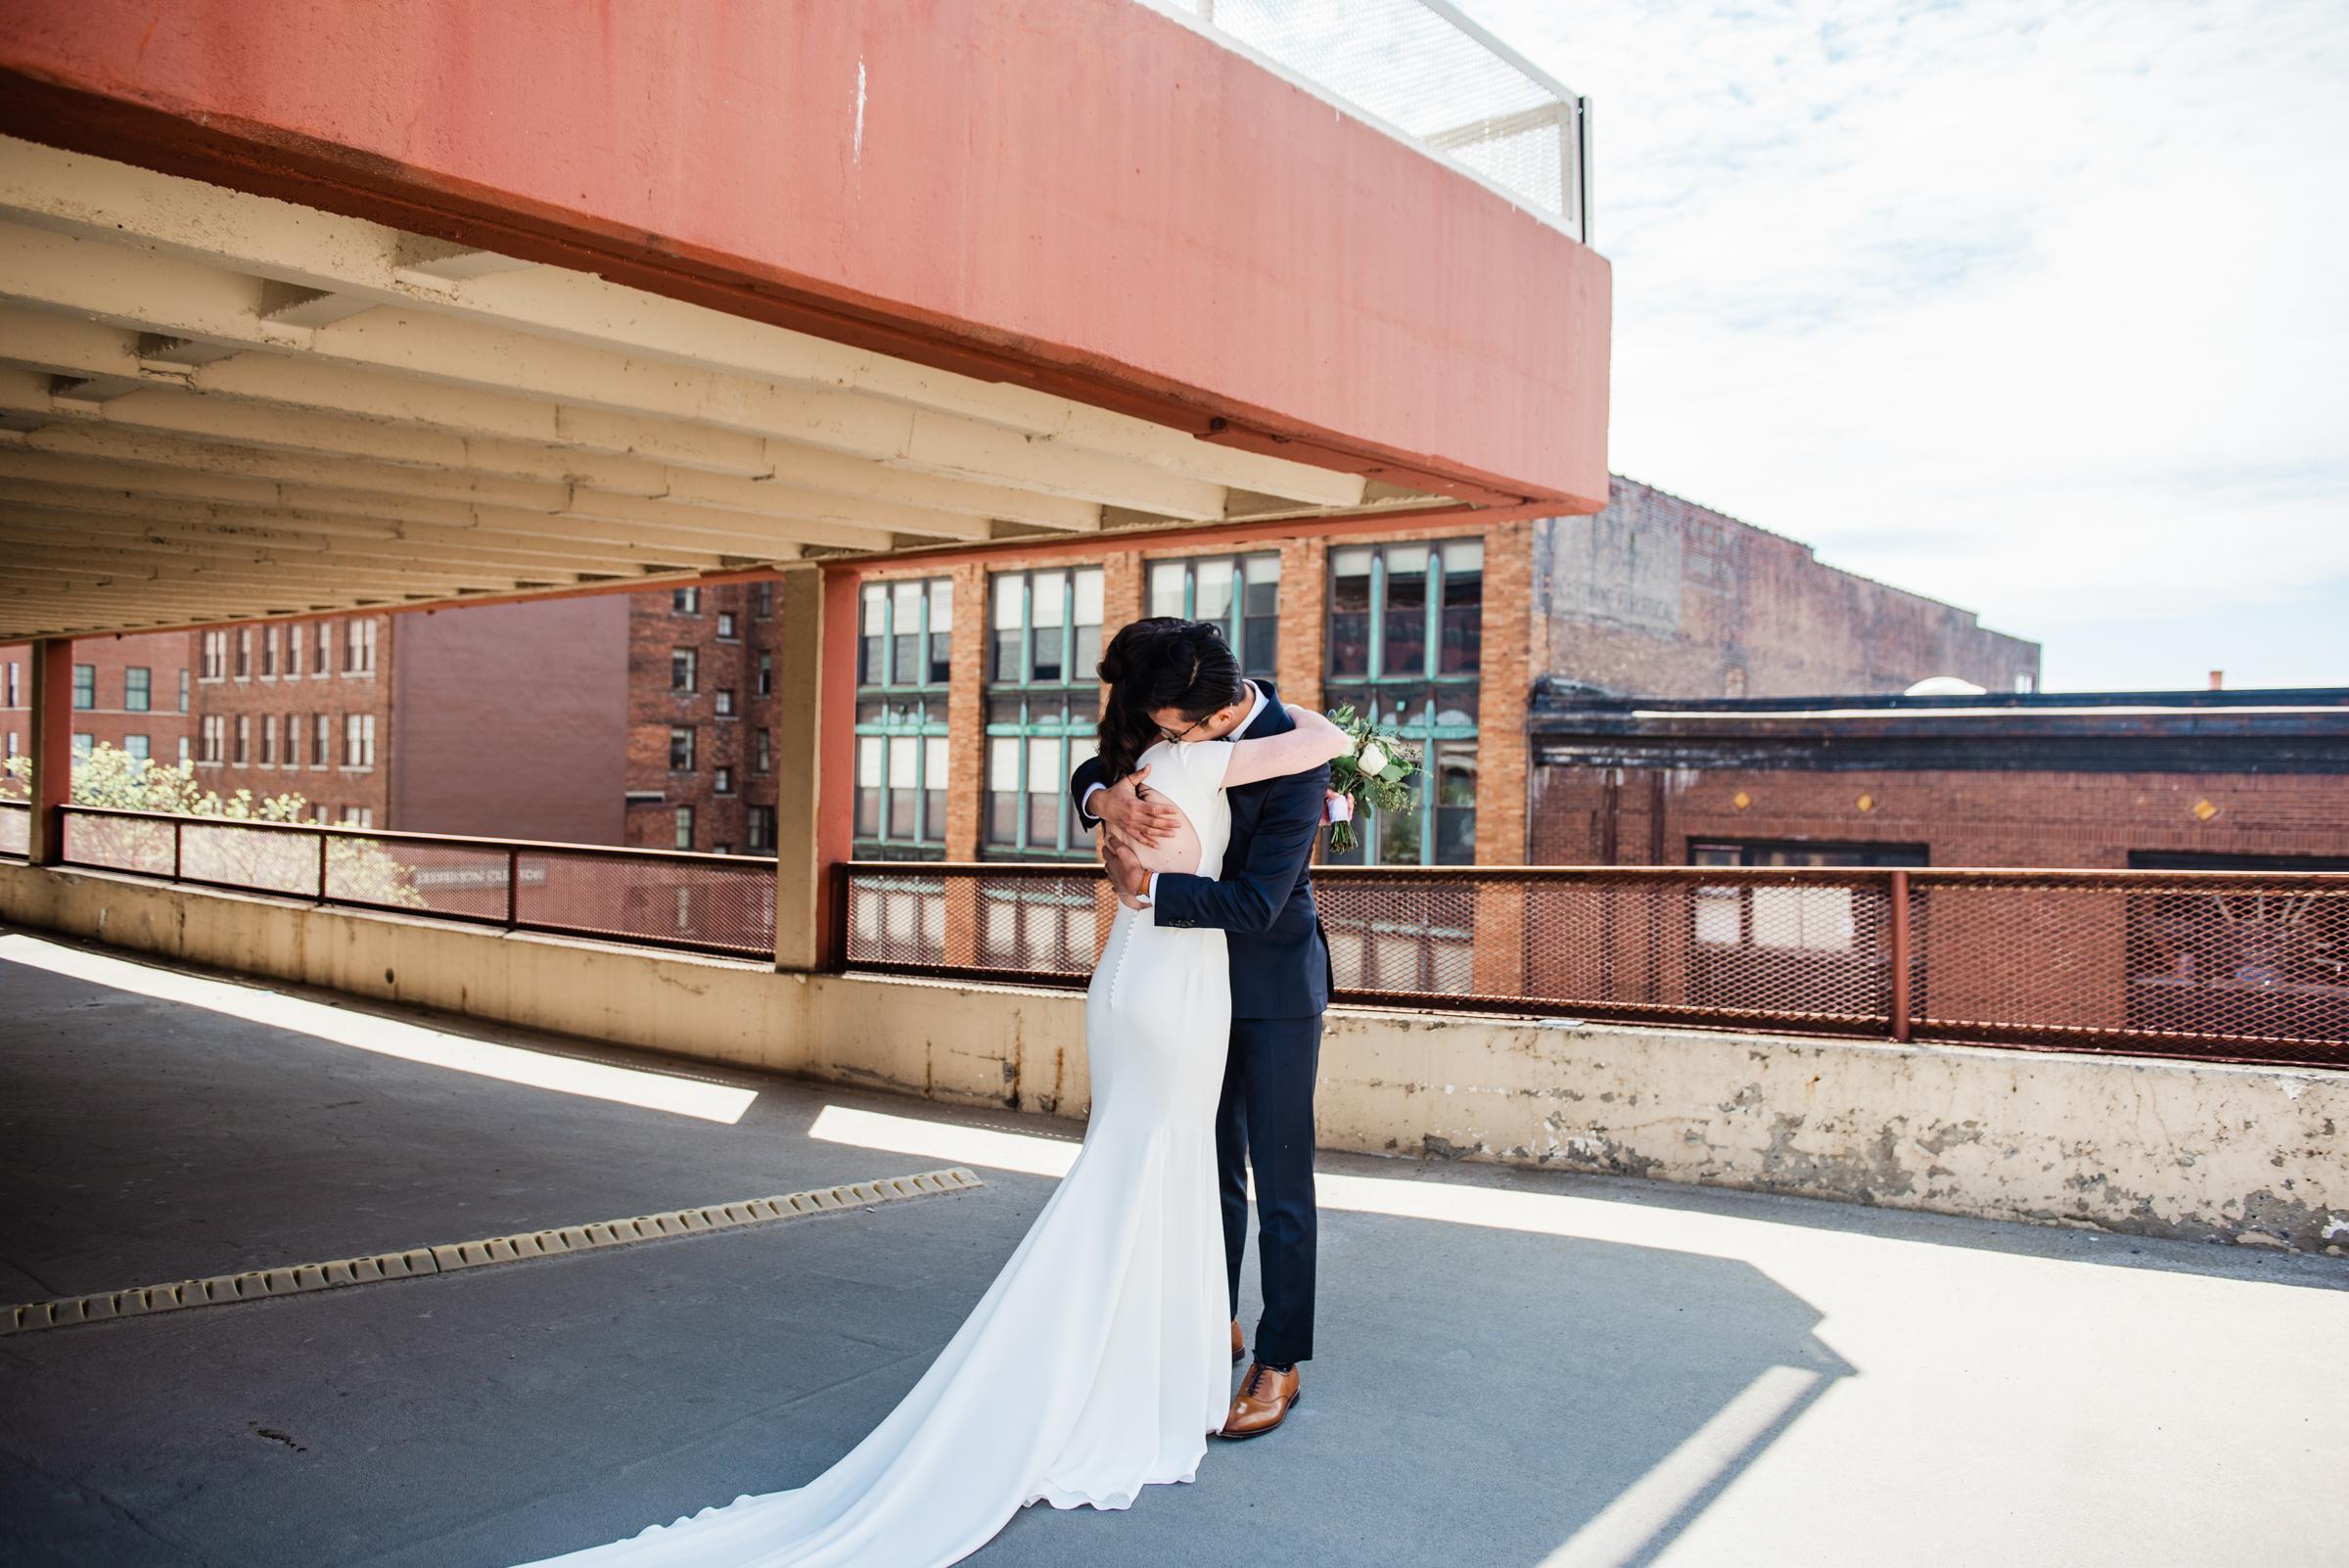 SKY_Armory_Syracuse_Wedding_JILL_STUDIO_Rochester_NY_Photographer_DSC_5195.jpg